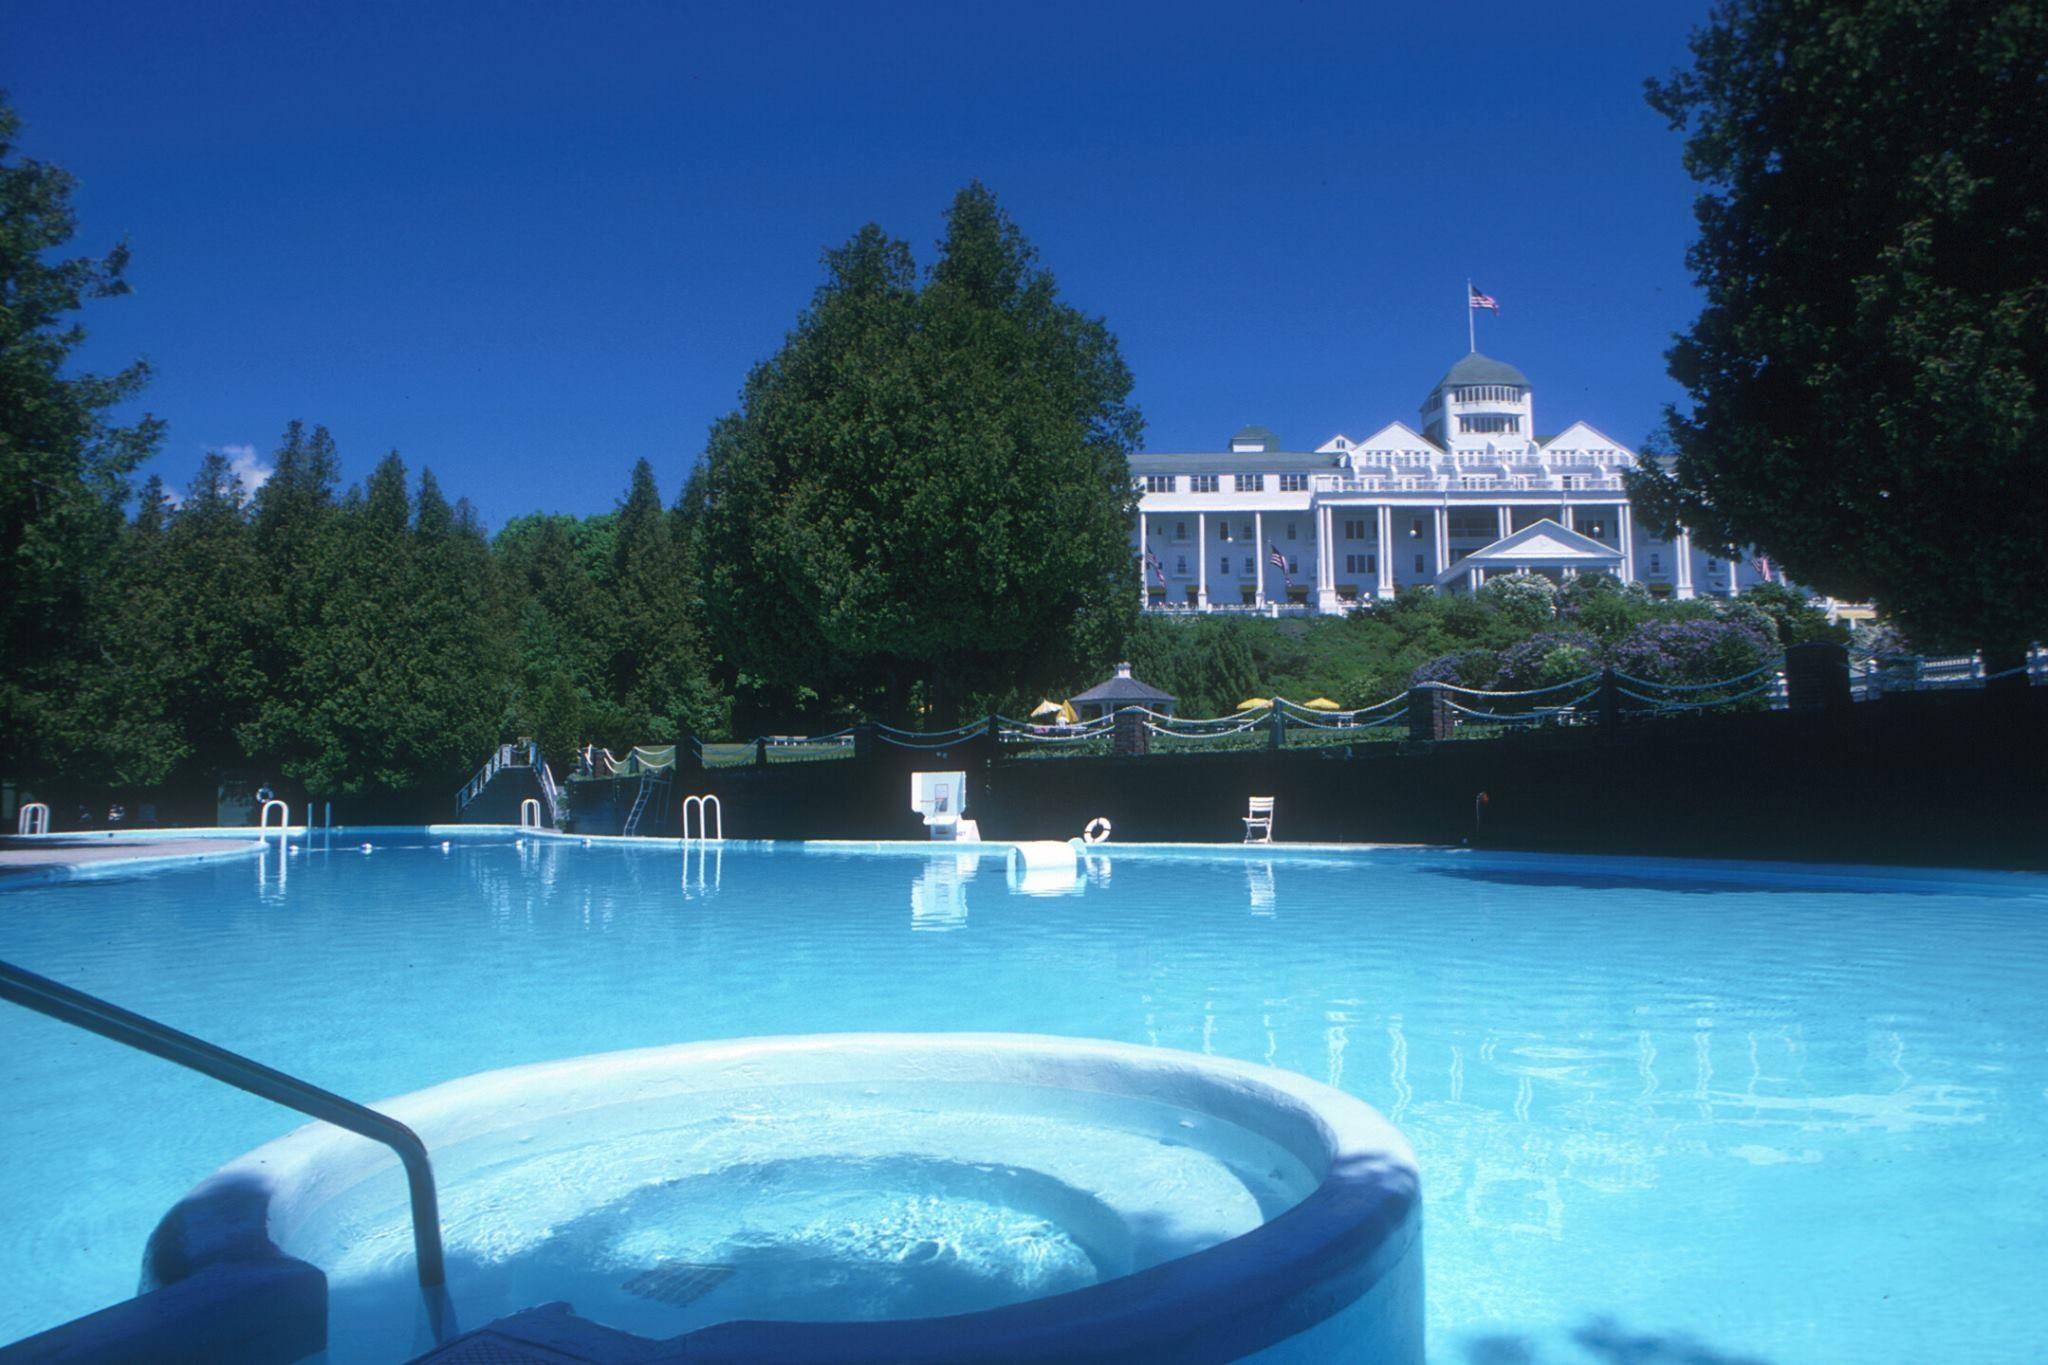 Grand Hotels Ester William Swimming Pool Mackinac Island Mackinac Island Mackinaw City Grand Hotel